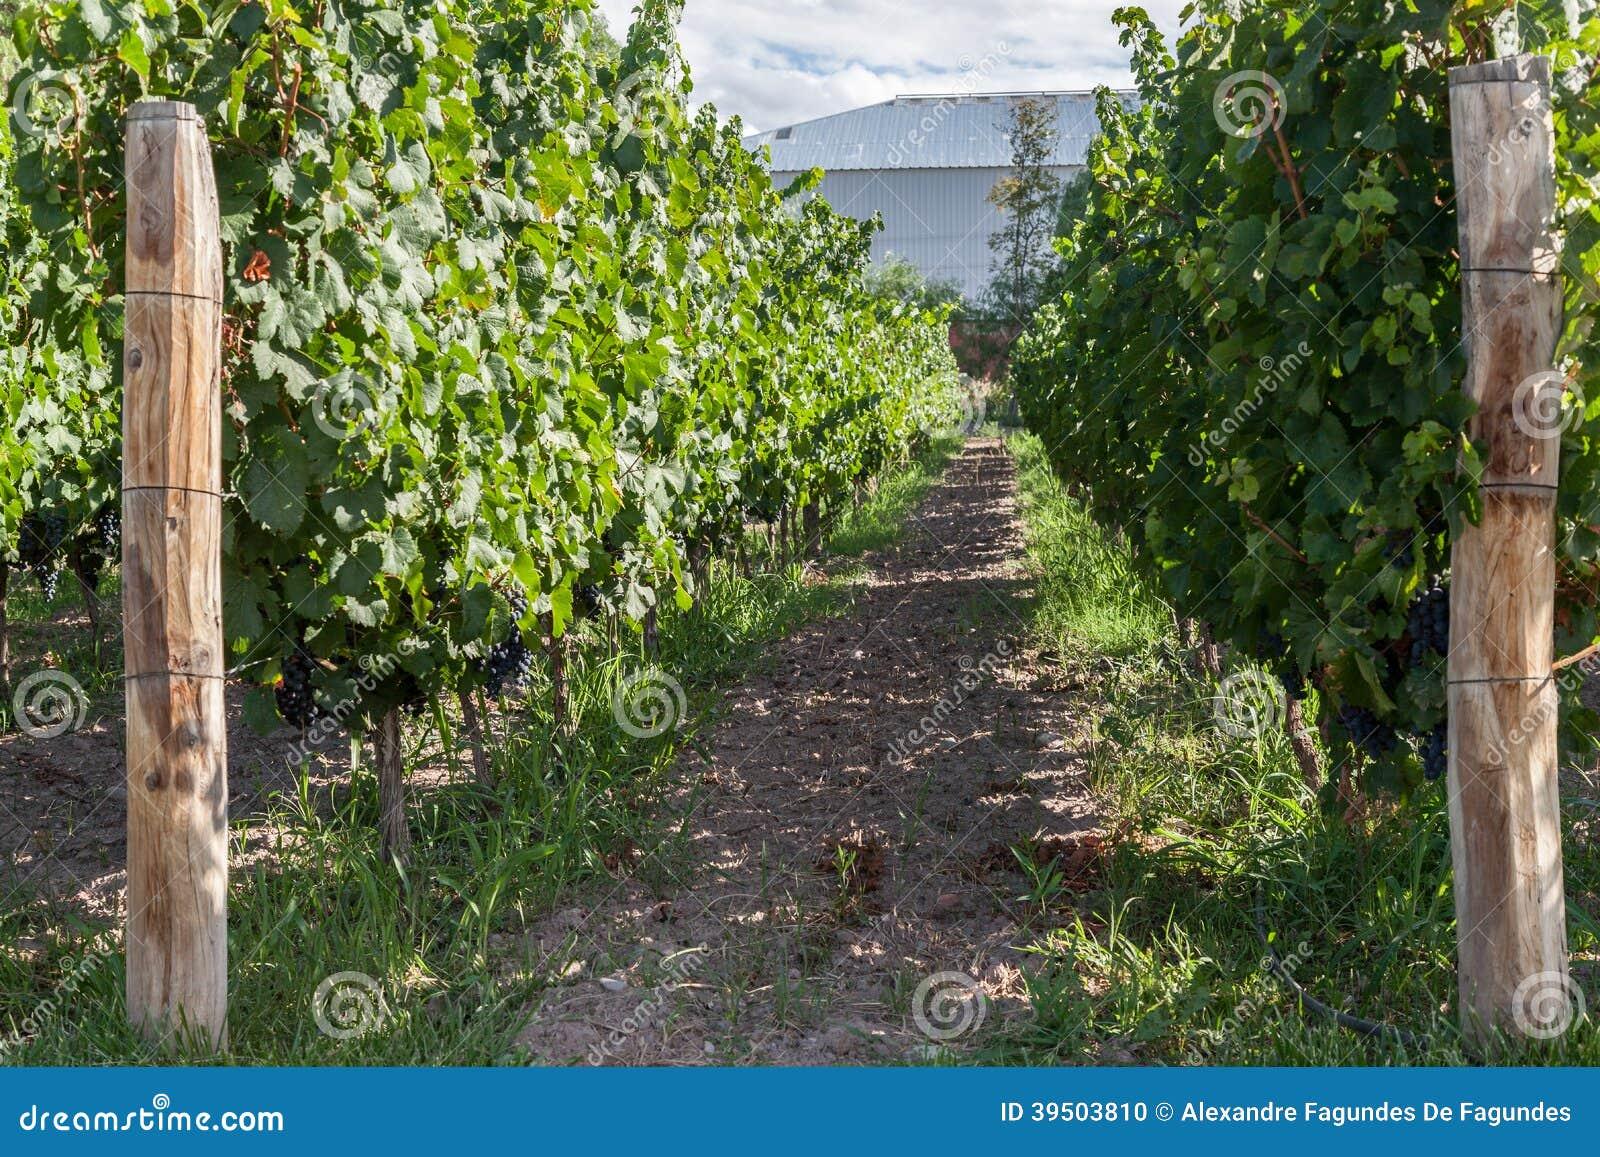 Vineyard in Mendoza Argentina